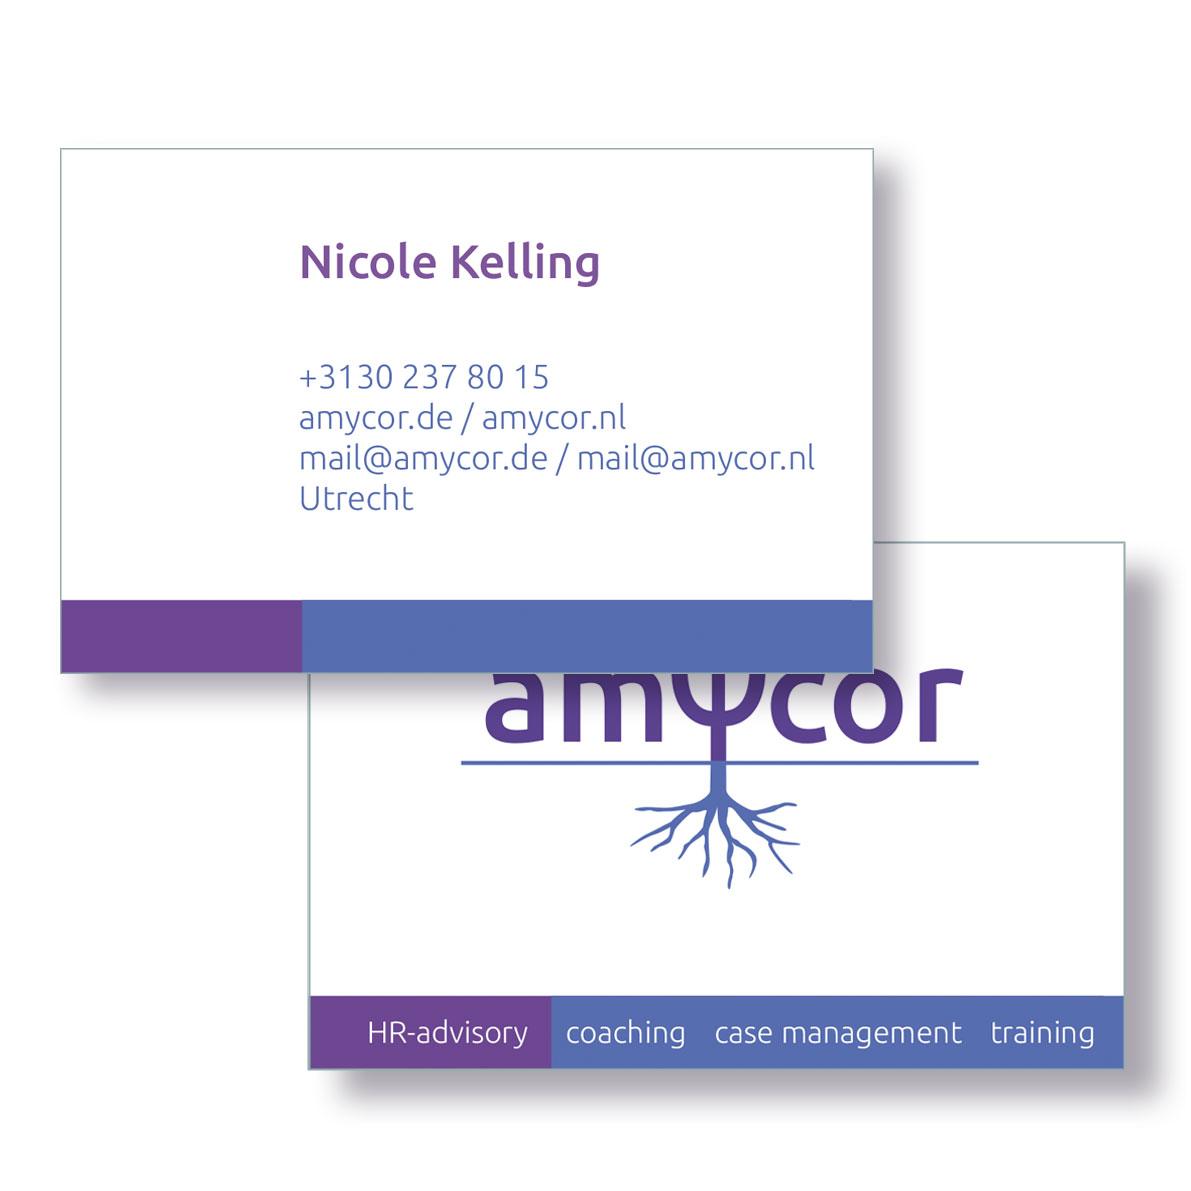 Amycor-visitekaart